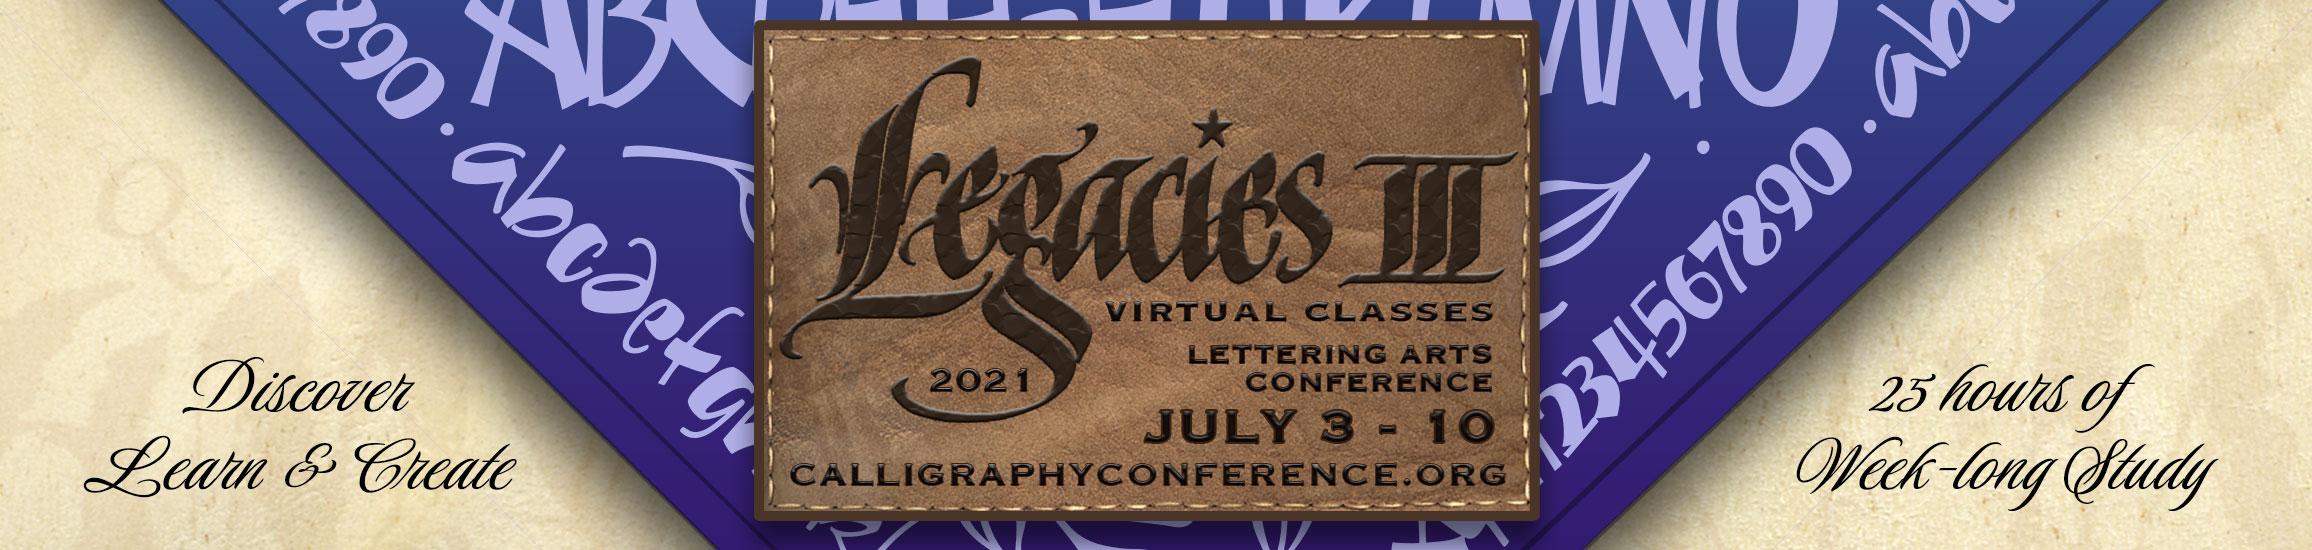 Legacies III International Lettering Arts Conference